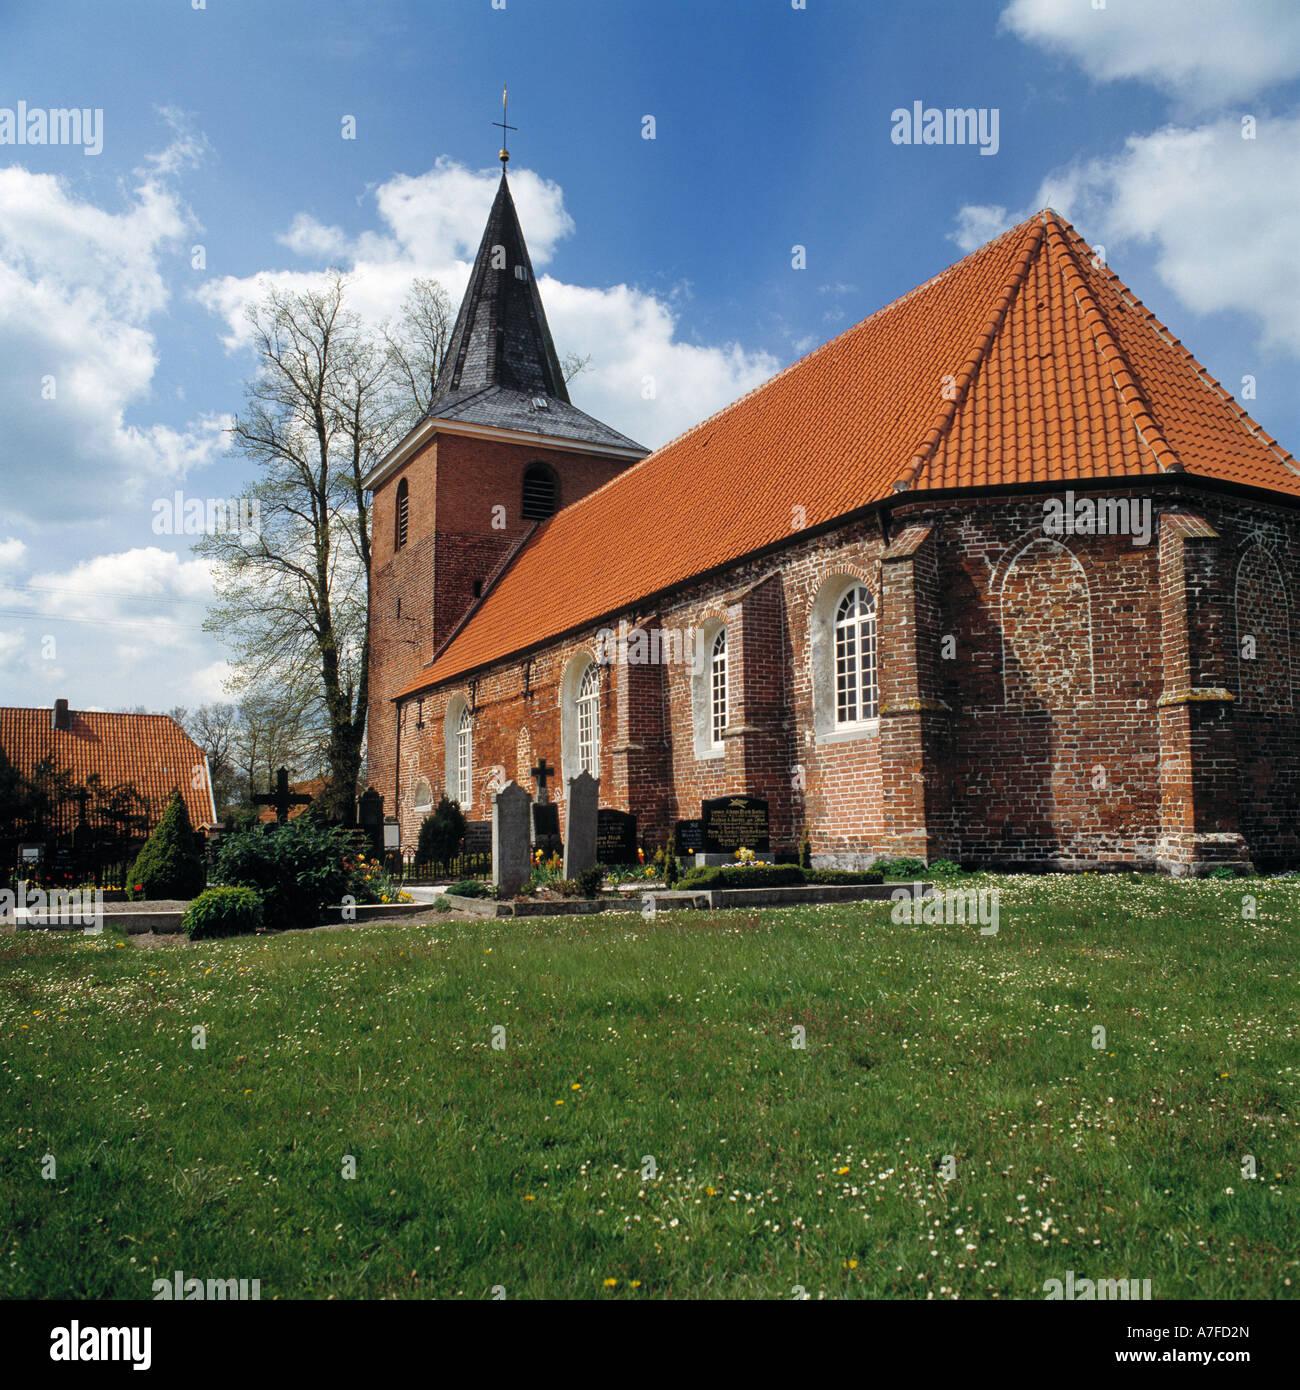 Collinghorst